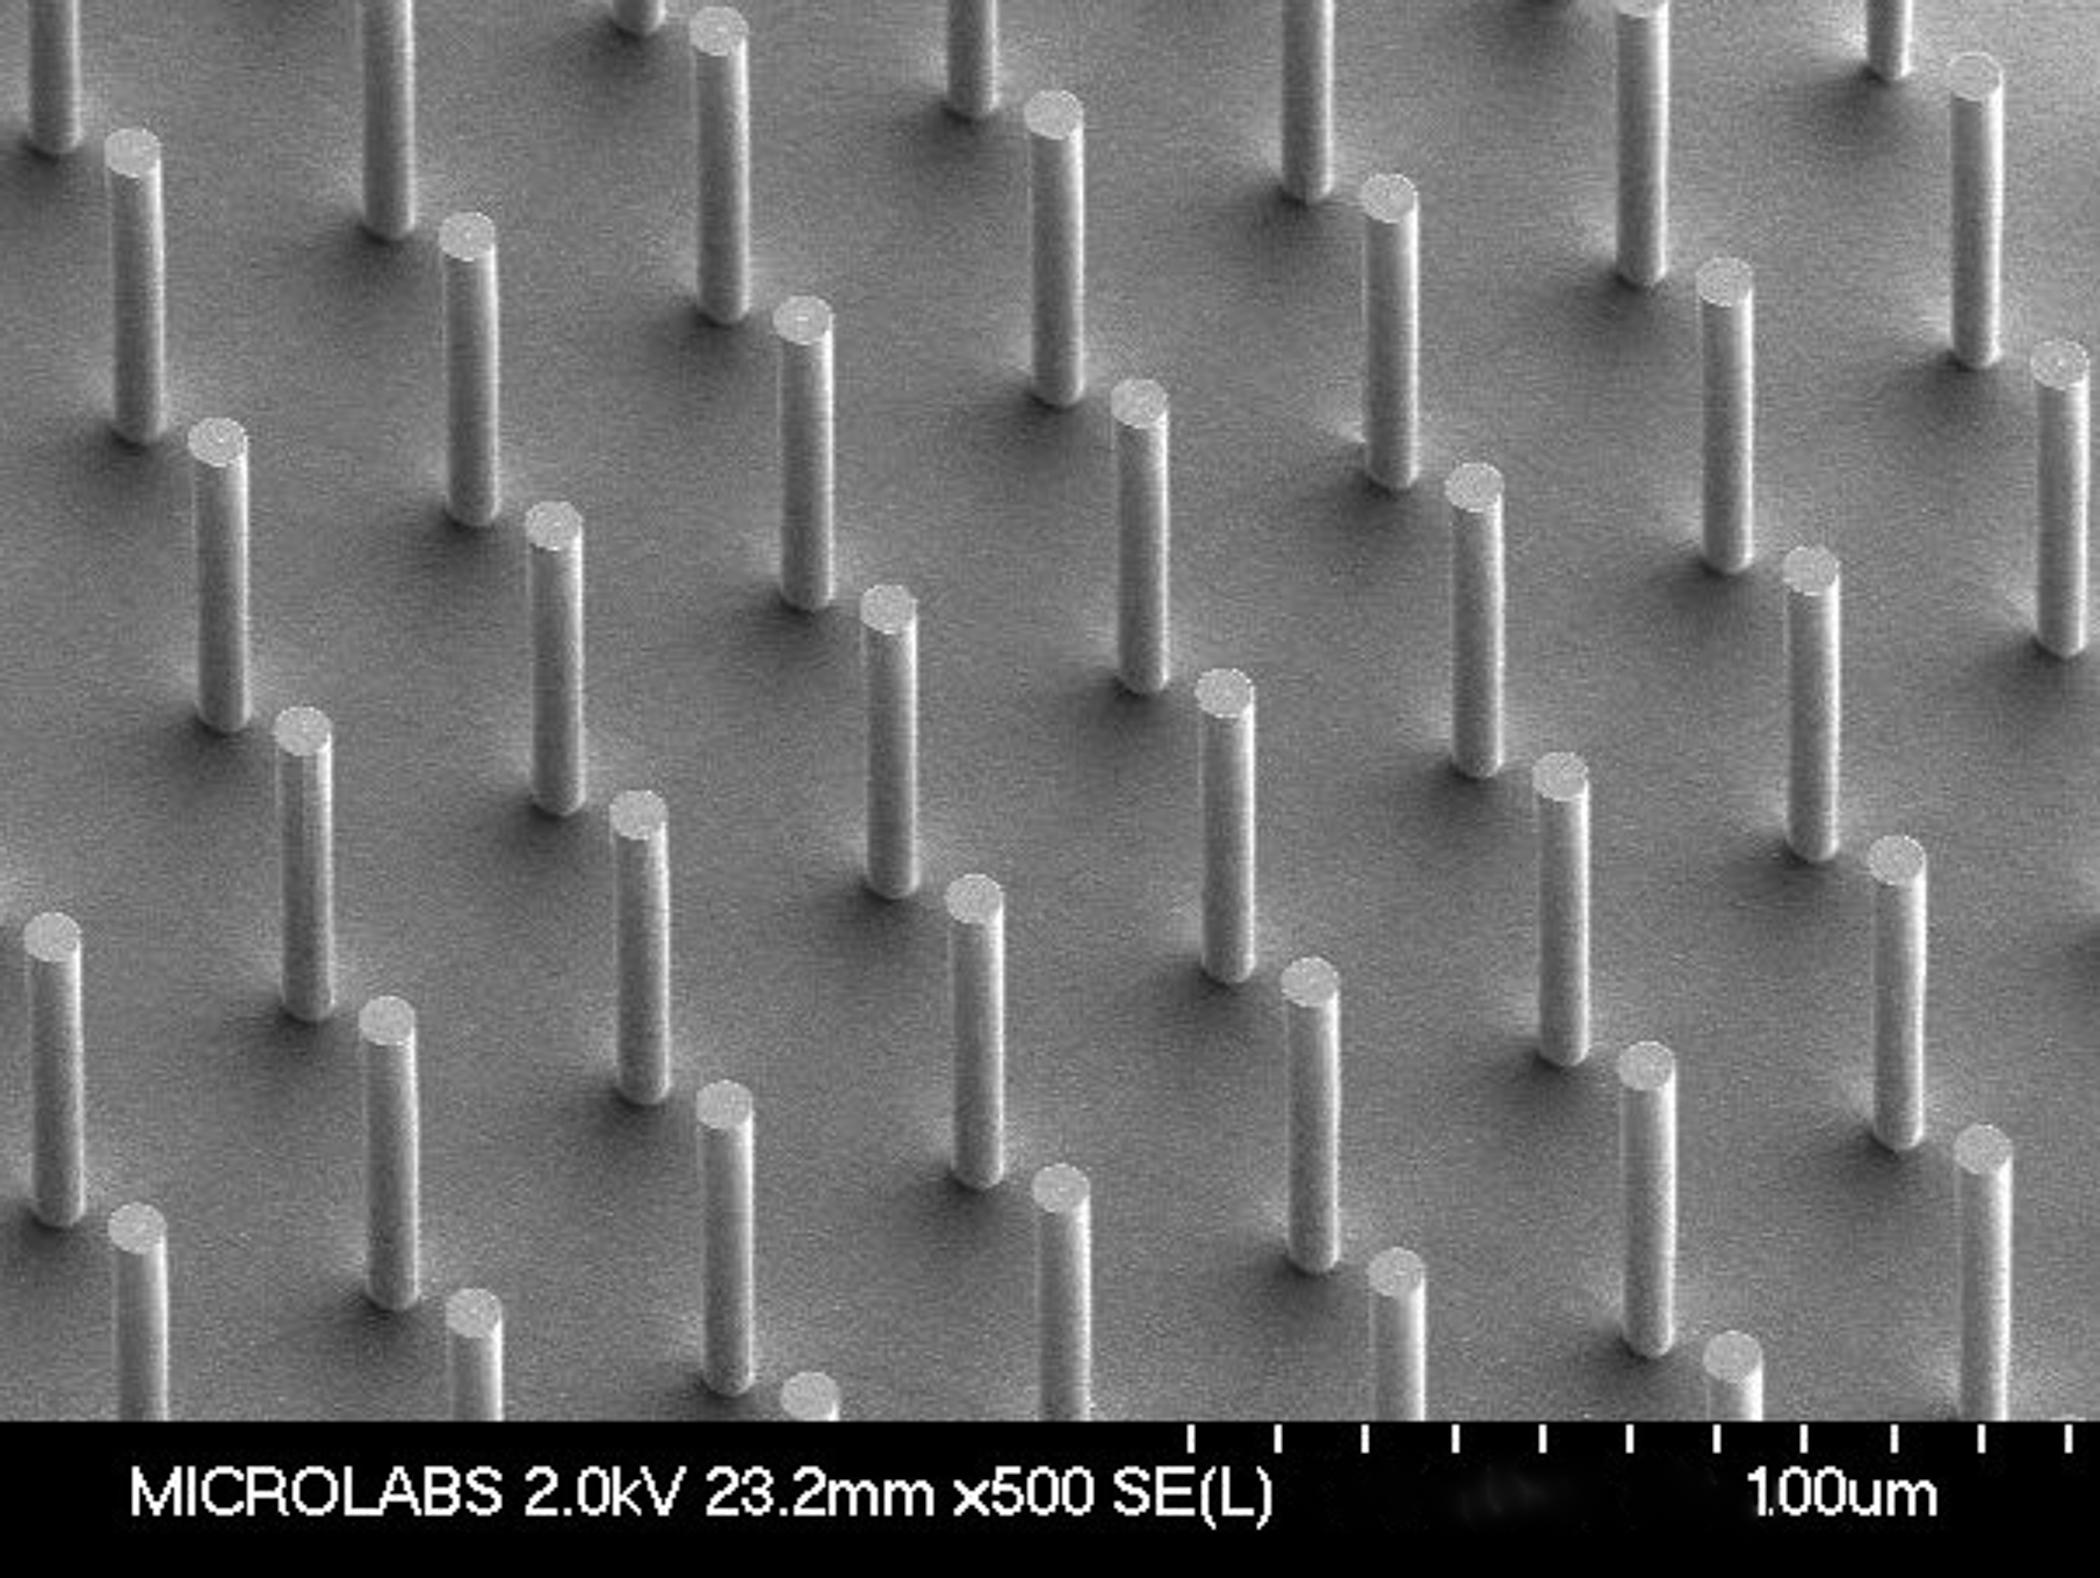 Sensera\'s MEMS Mimic Human Organs Through Bioengineering | Business Wire